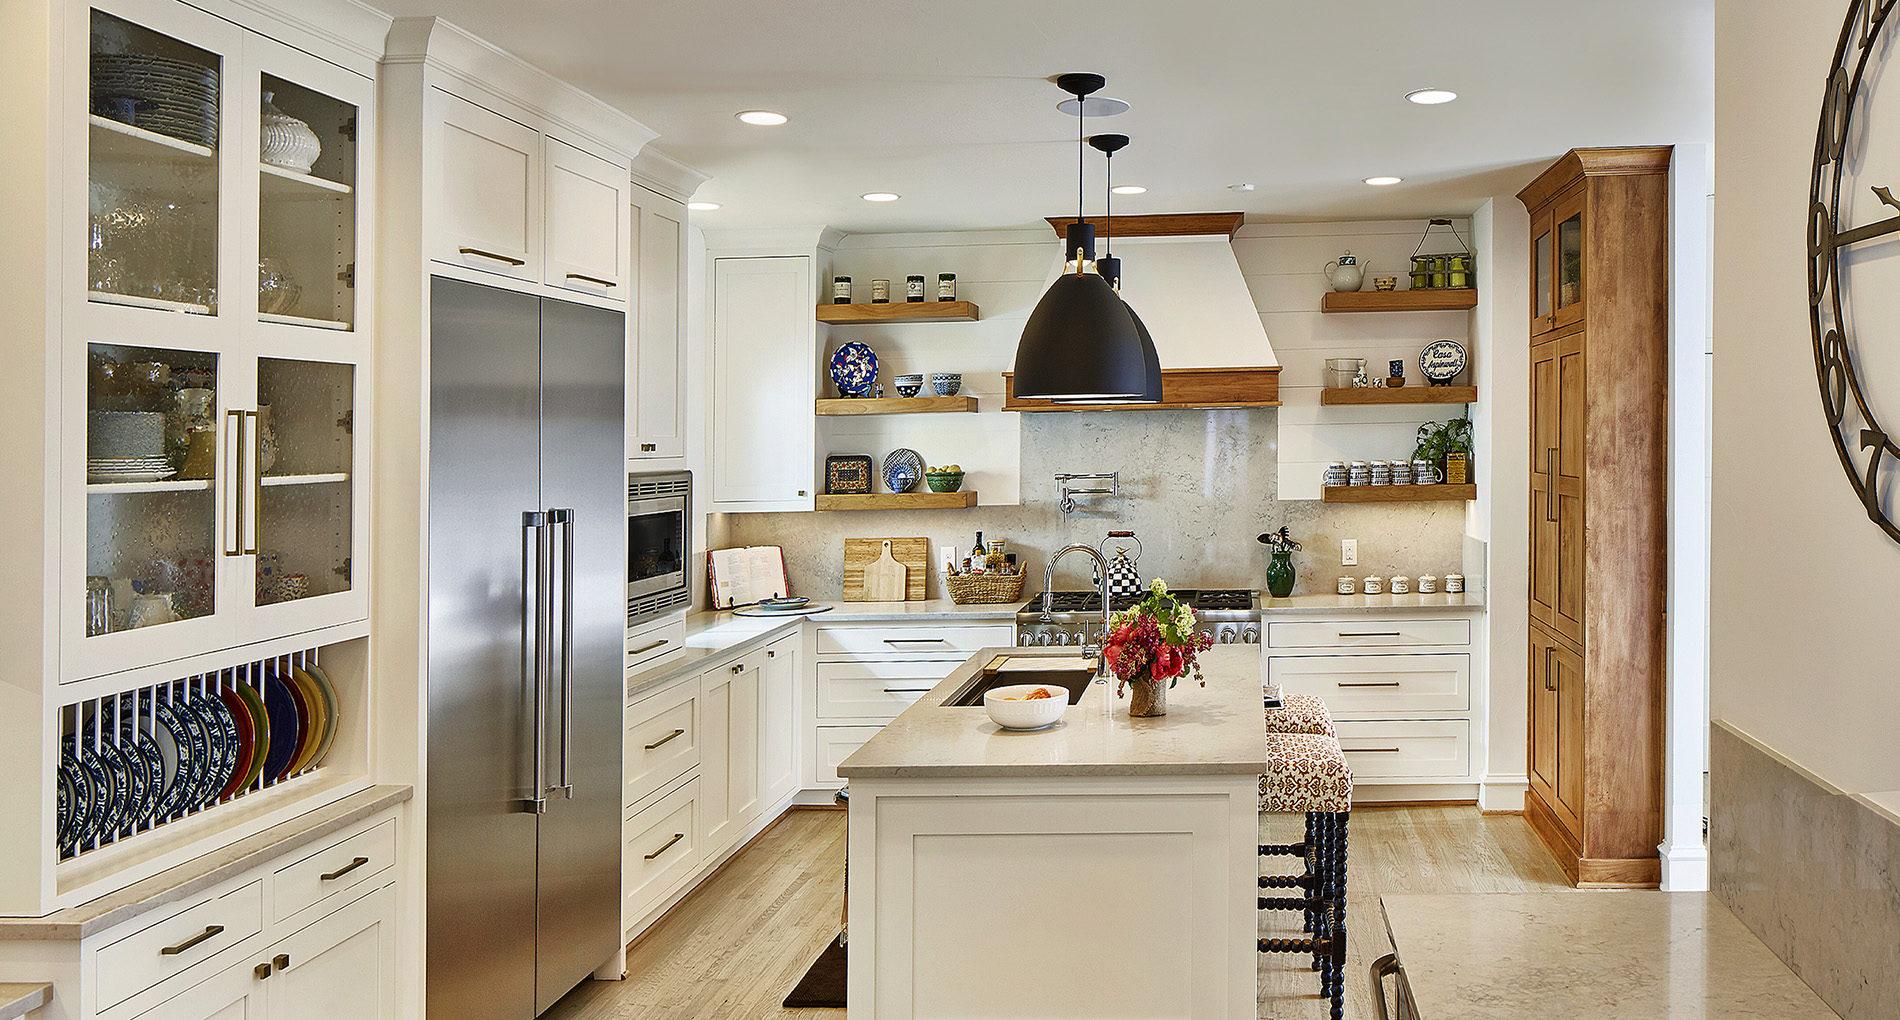 Kitchen Remodeling & Custom Design in Dallas | Alair Homes Dallas